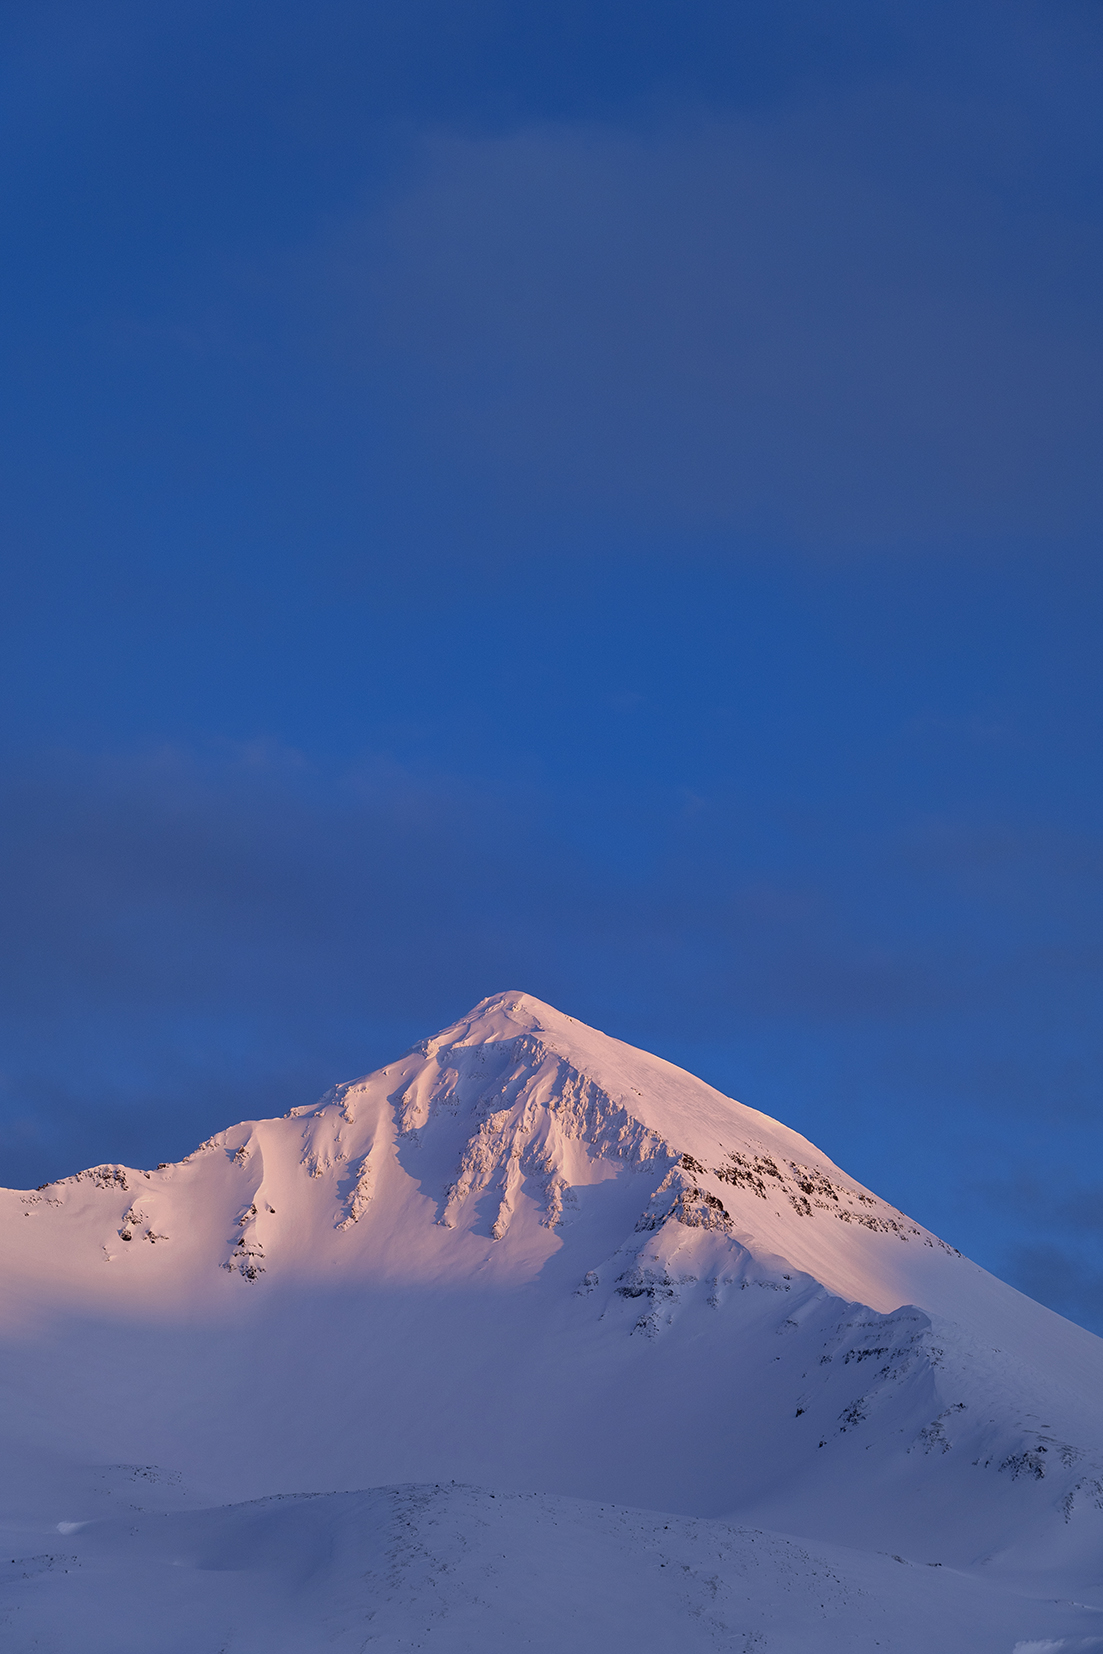 Montagne rose ciel bleu coucher du soleil Siglufjörður Islande du Nord